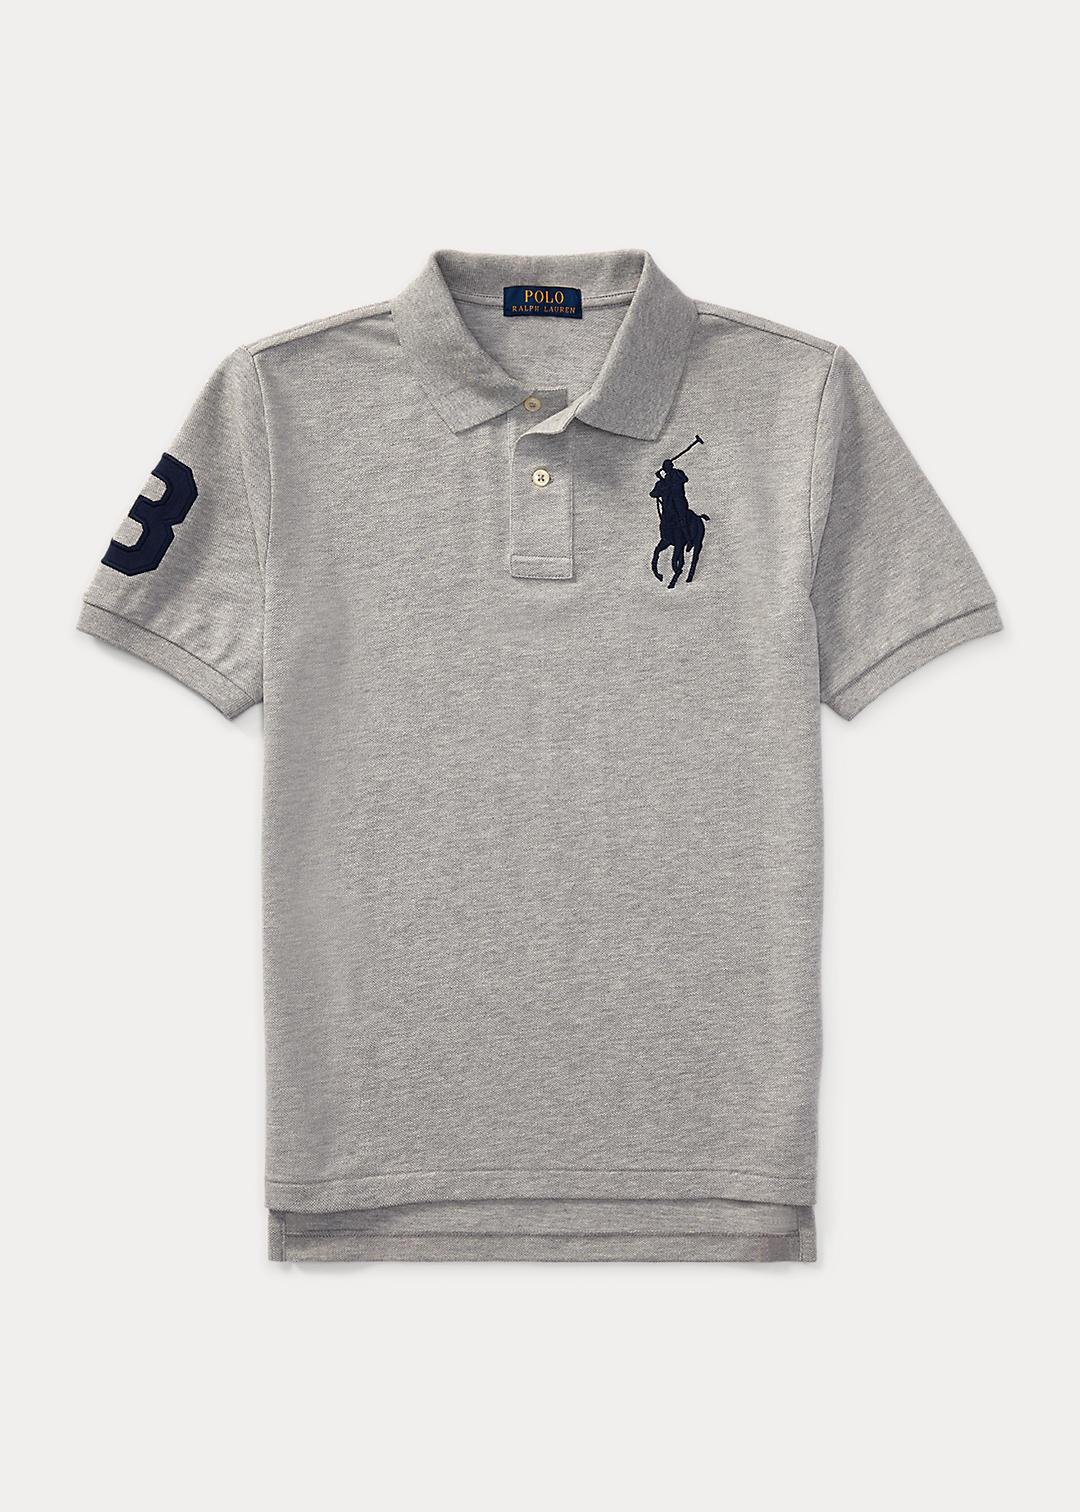 Big Pony Cotton Mesh Polo